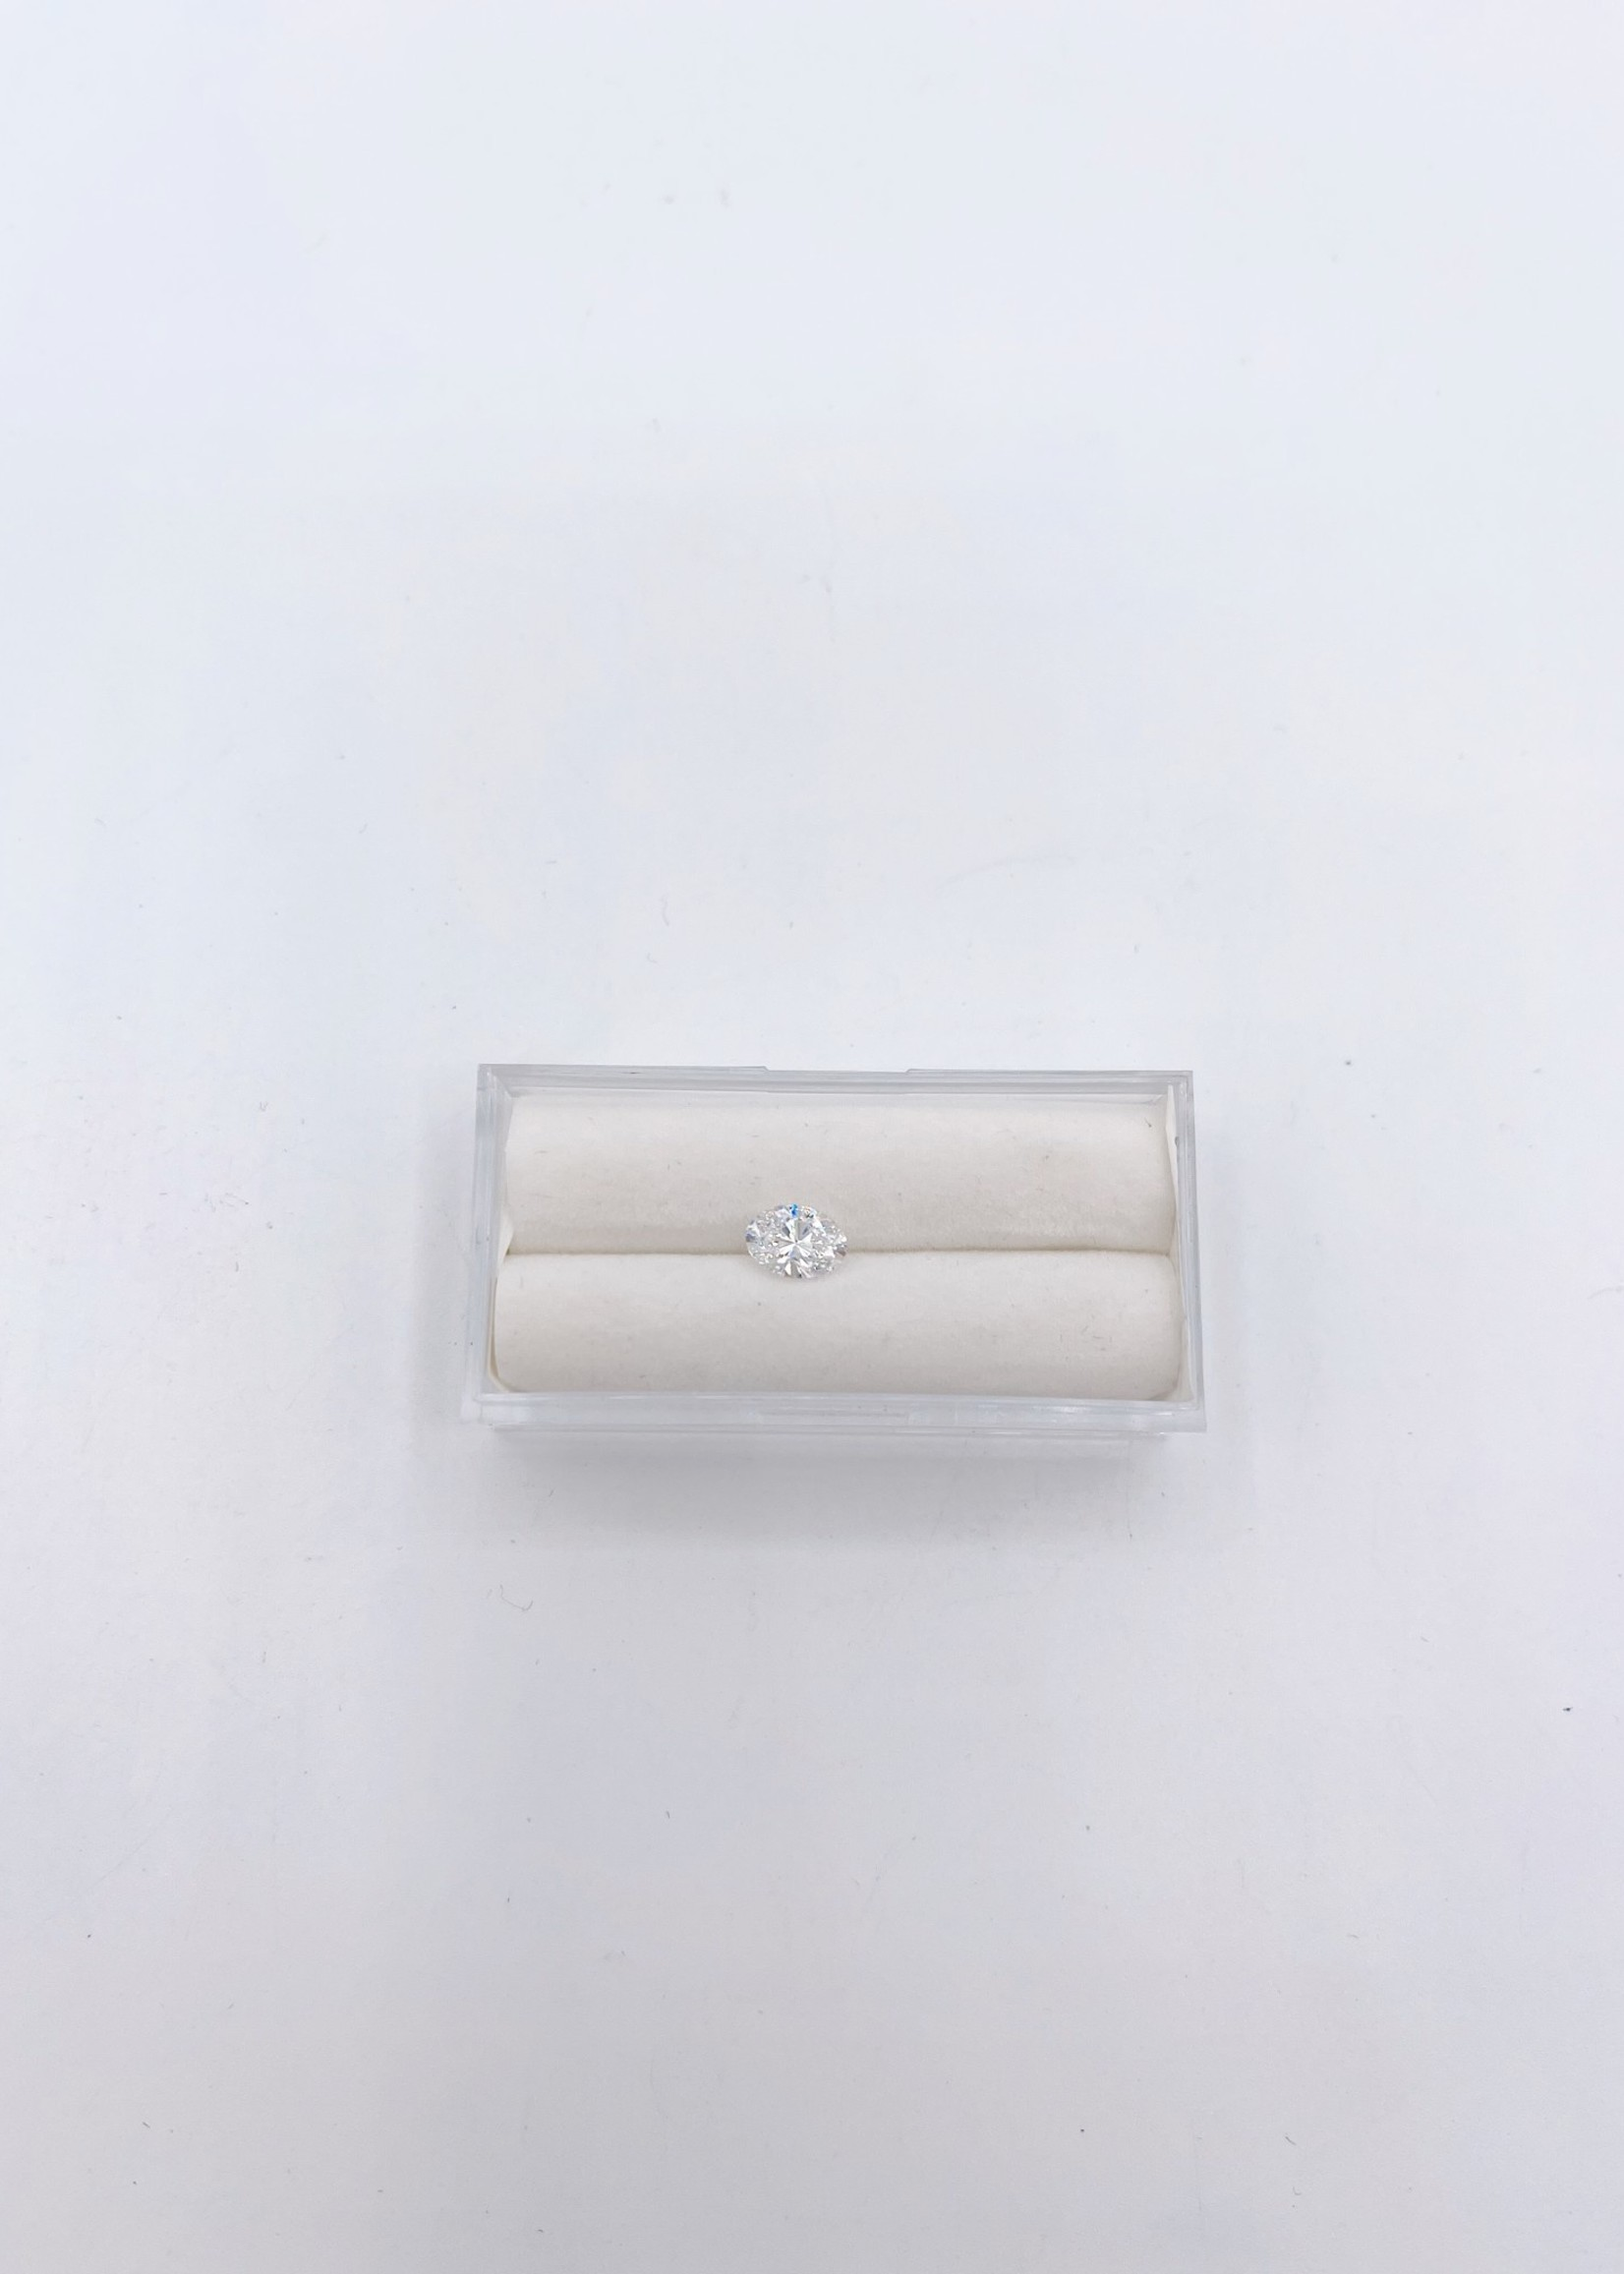 Lannyte Lannyte Oval Cut 1.17ct 7x5mm White